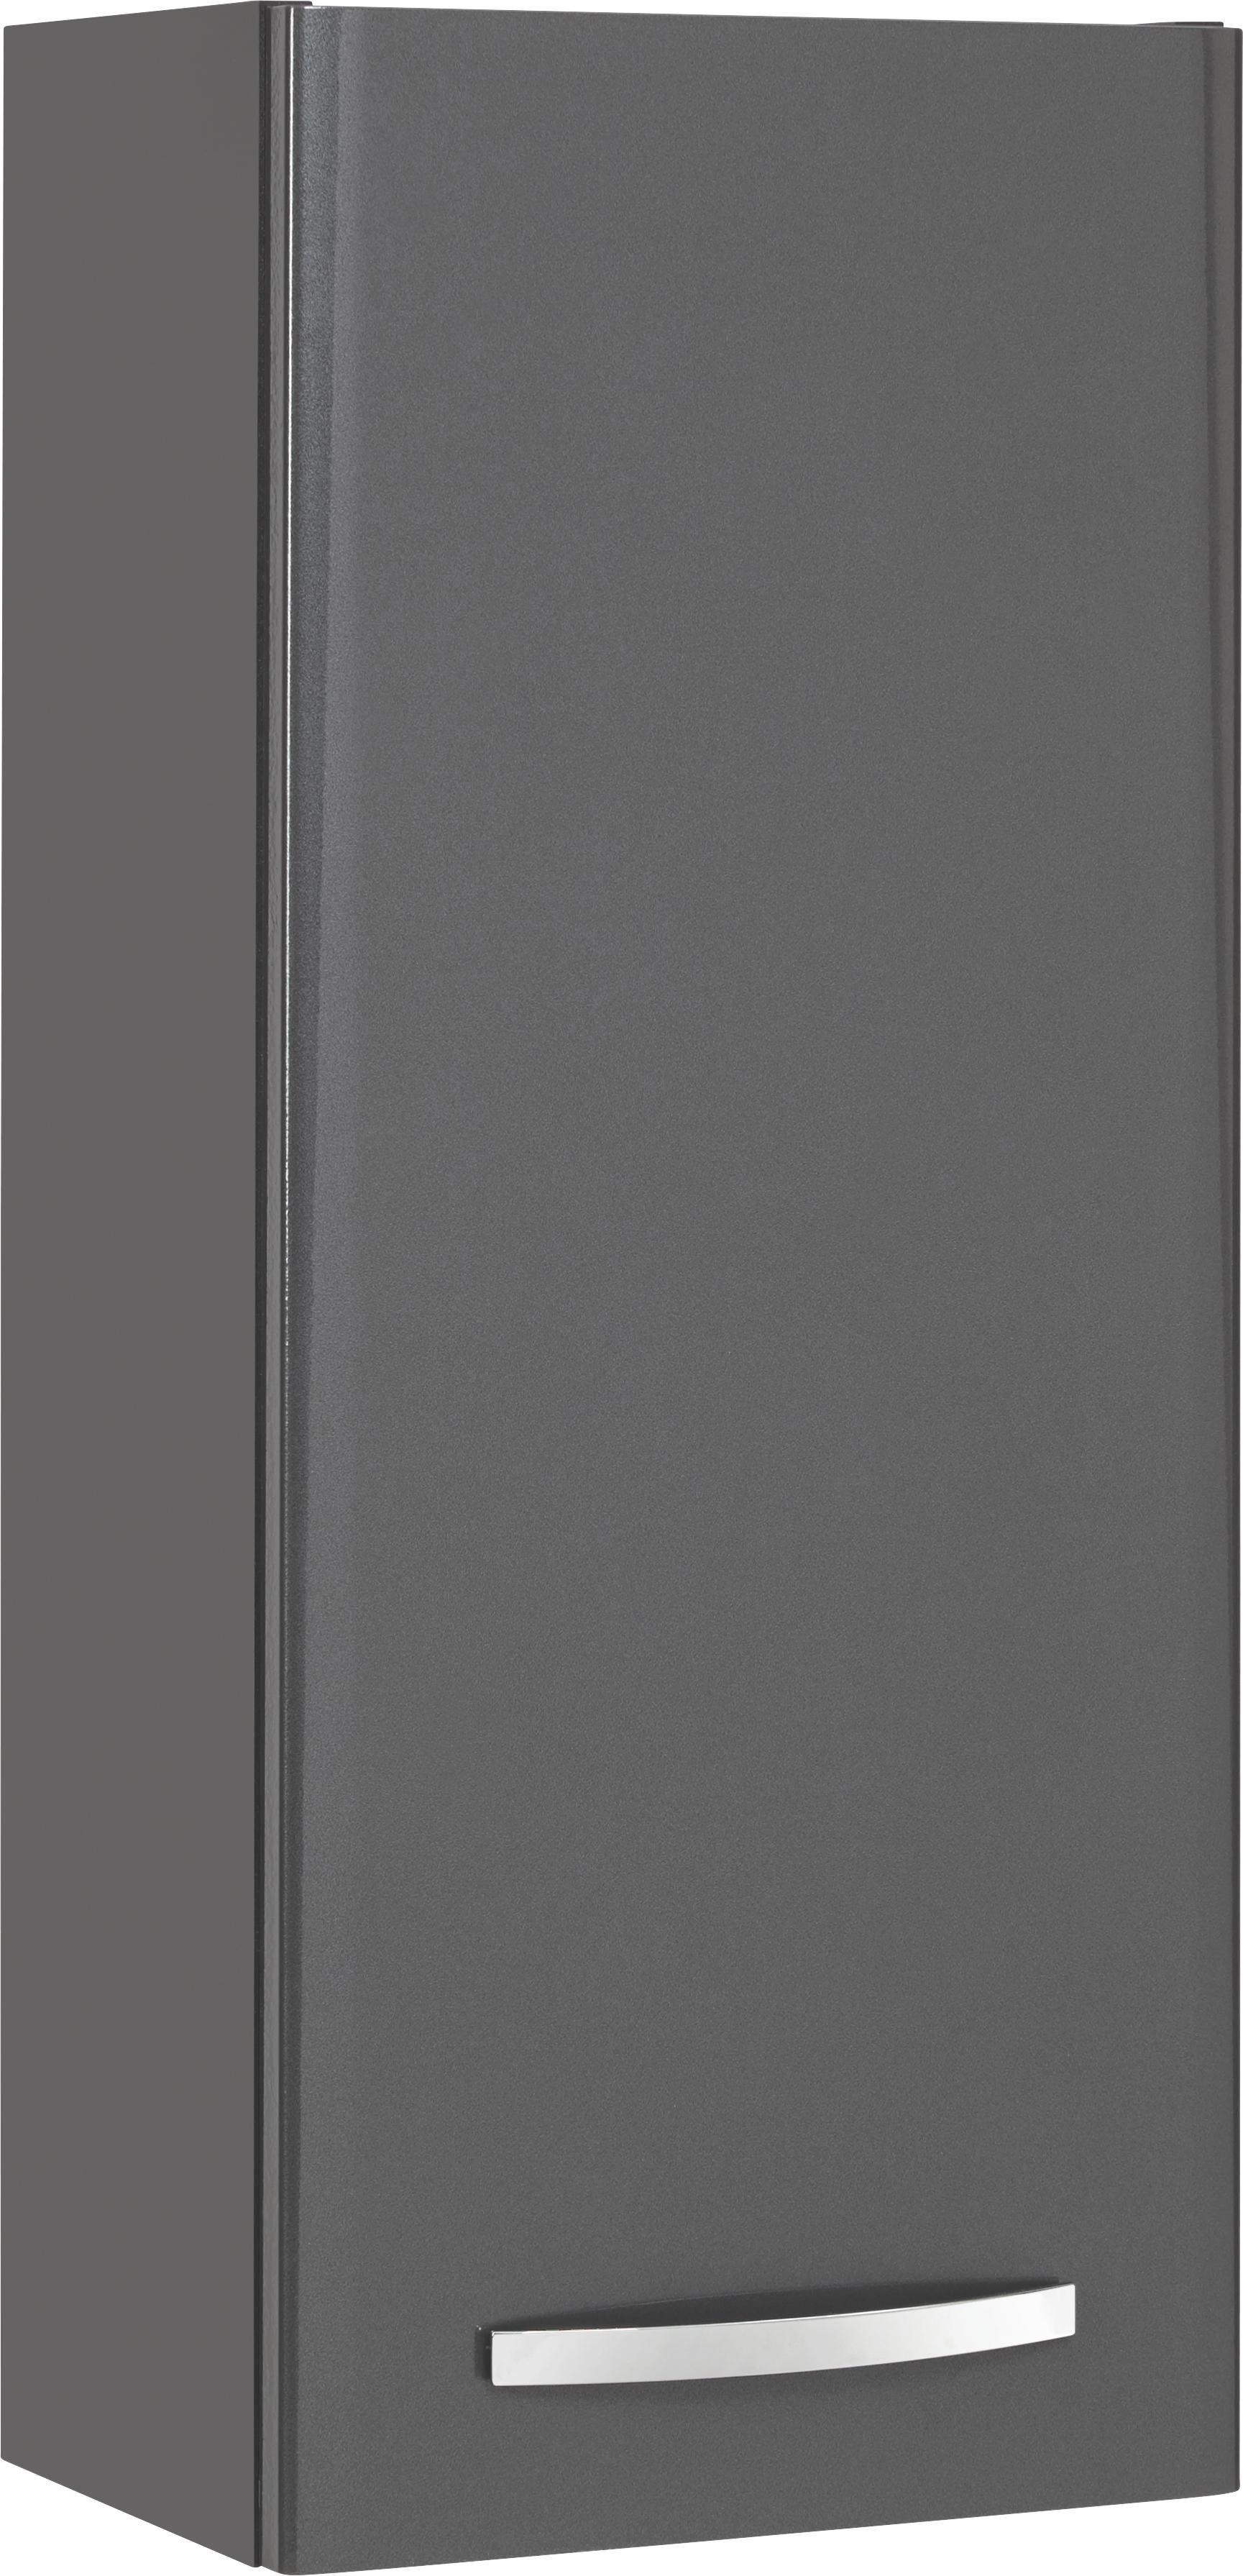 Viseći Element Element Viseći - antracit, Moderno, drvo (30/70/20cm)